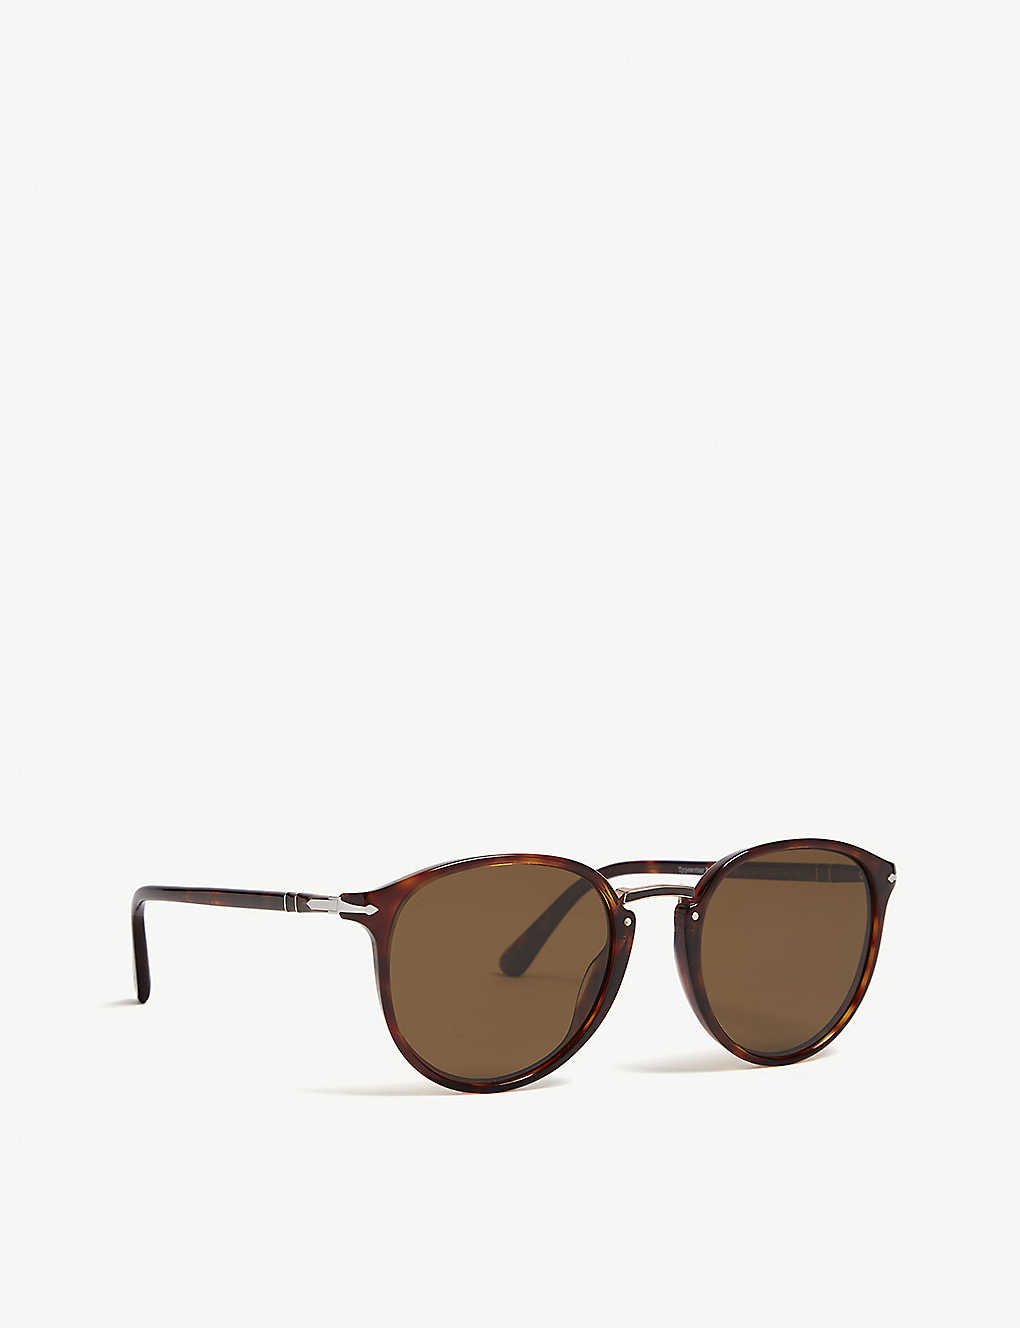 14e39c890d ... Po3210 Typewriter Edition round-frame sunglasses - Havana ...